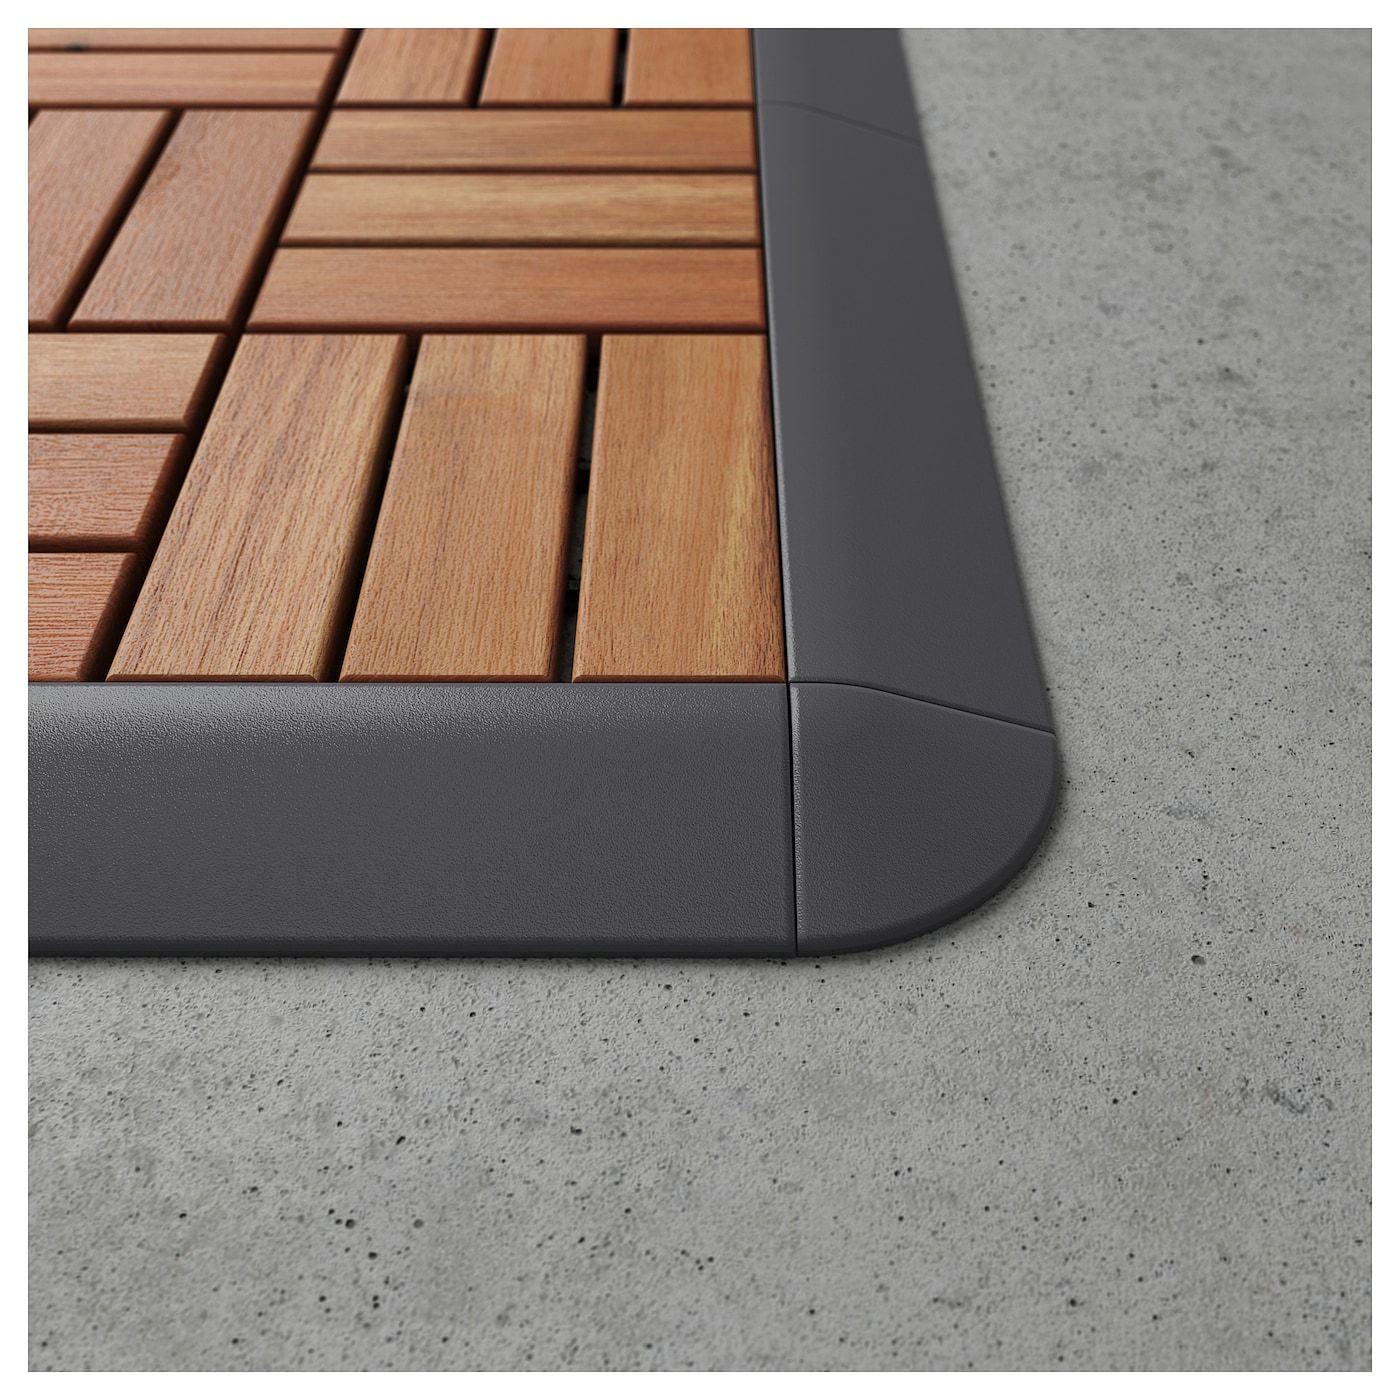 IKEA US - Furniture and Home Furnishings  Ikea outdoor flooring